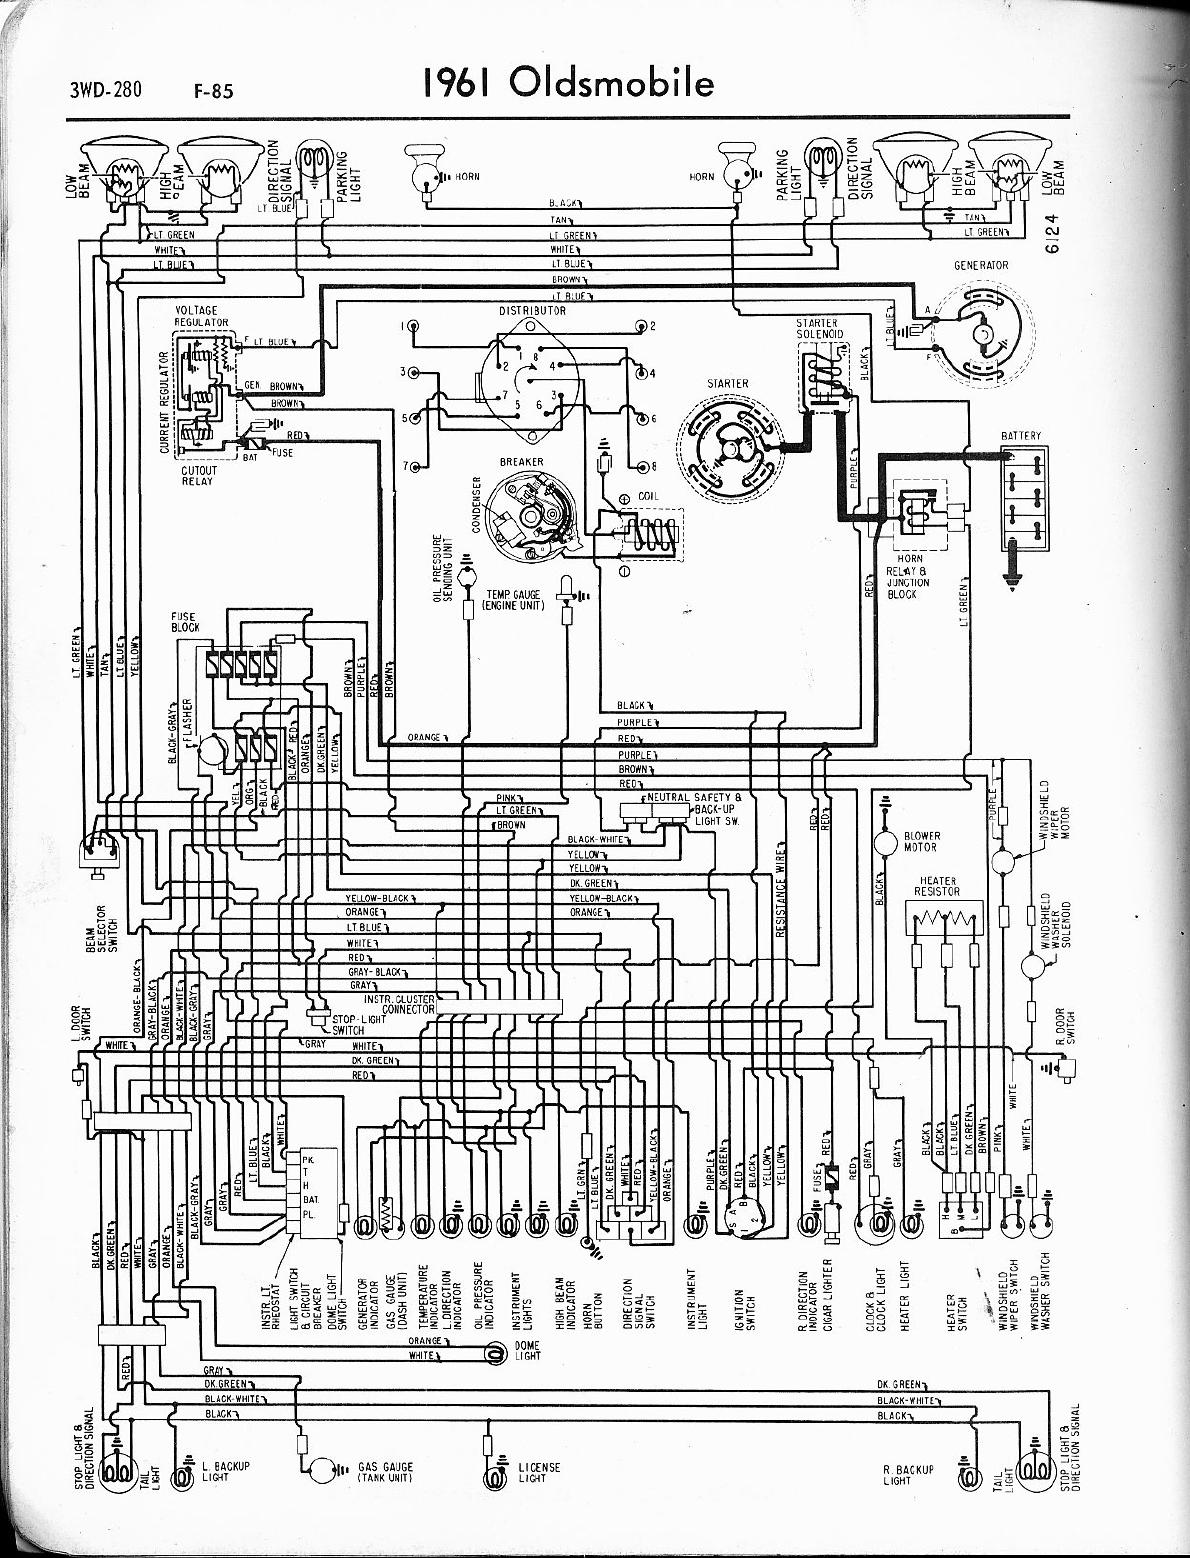 mw_9967] cutlass wire diagram schematic wiring  iosco xtern hemt hapolo mohammedshrine librar wiring 101